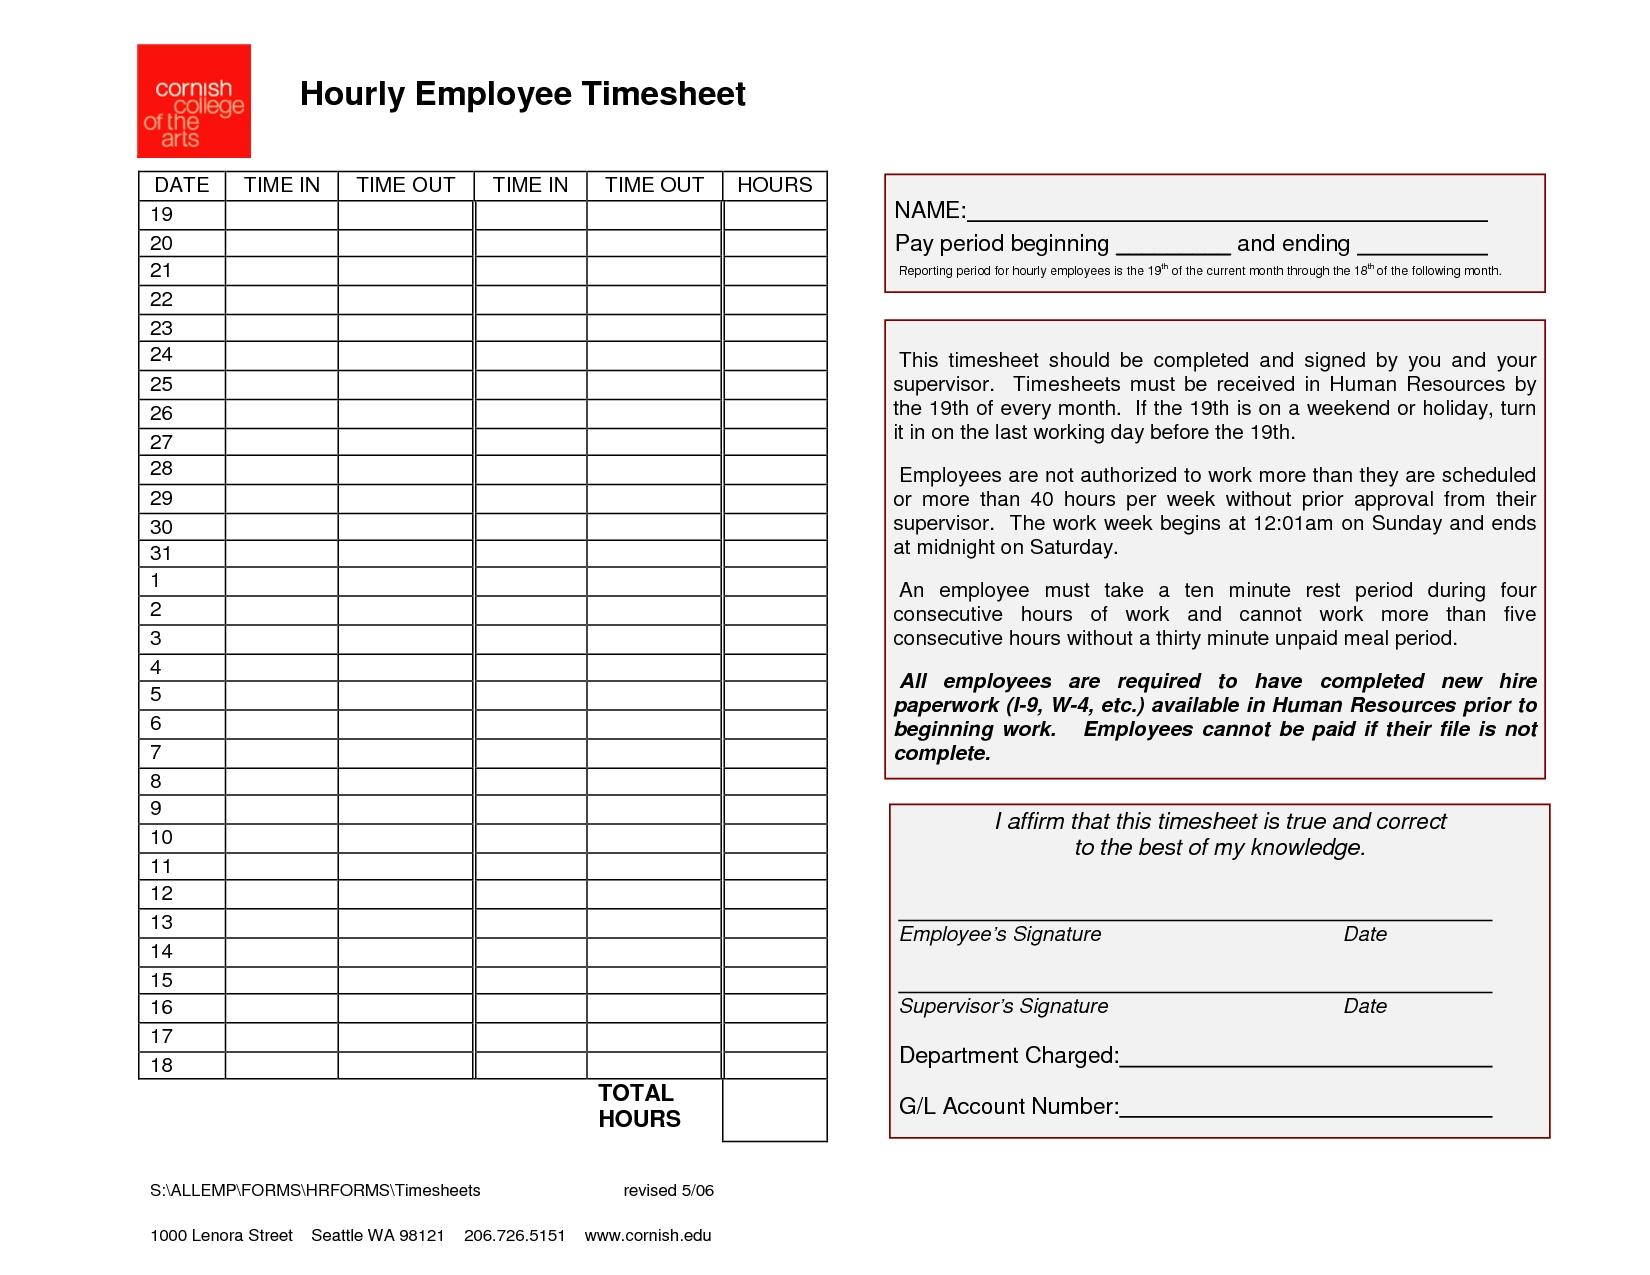 Employee Timesheet Template | Generic Hourly Employee Timesheet with regard to Printable Blank Hourly Income Worksheet